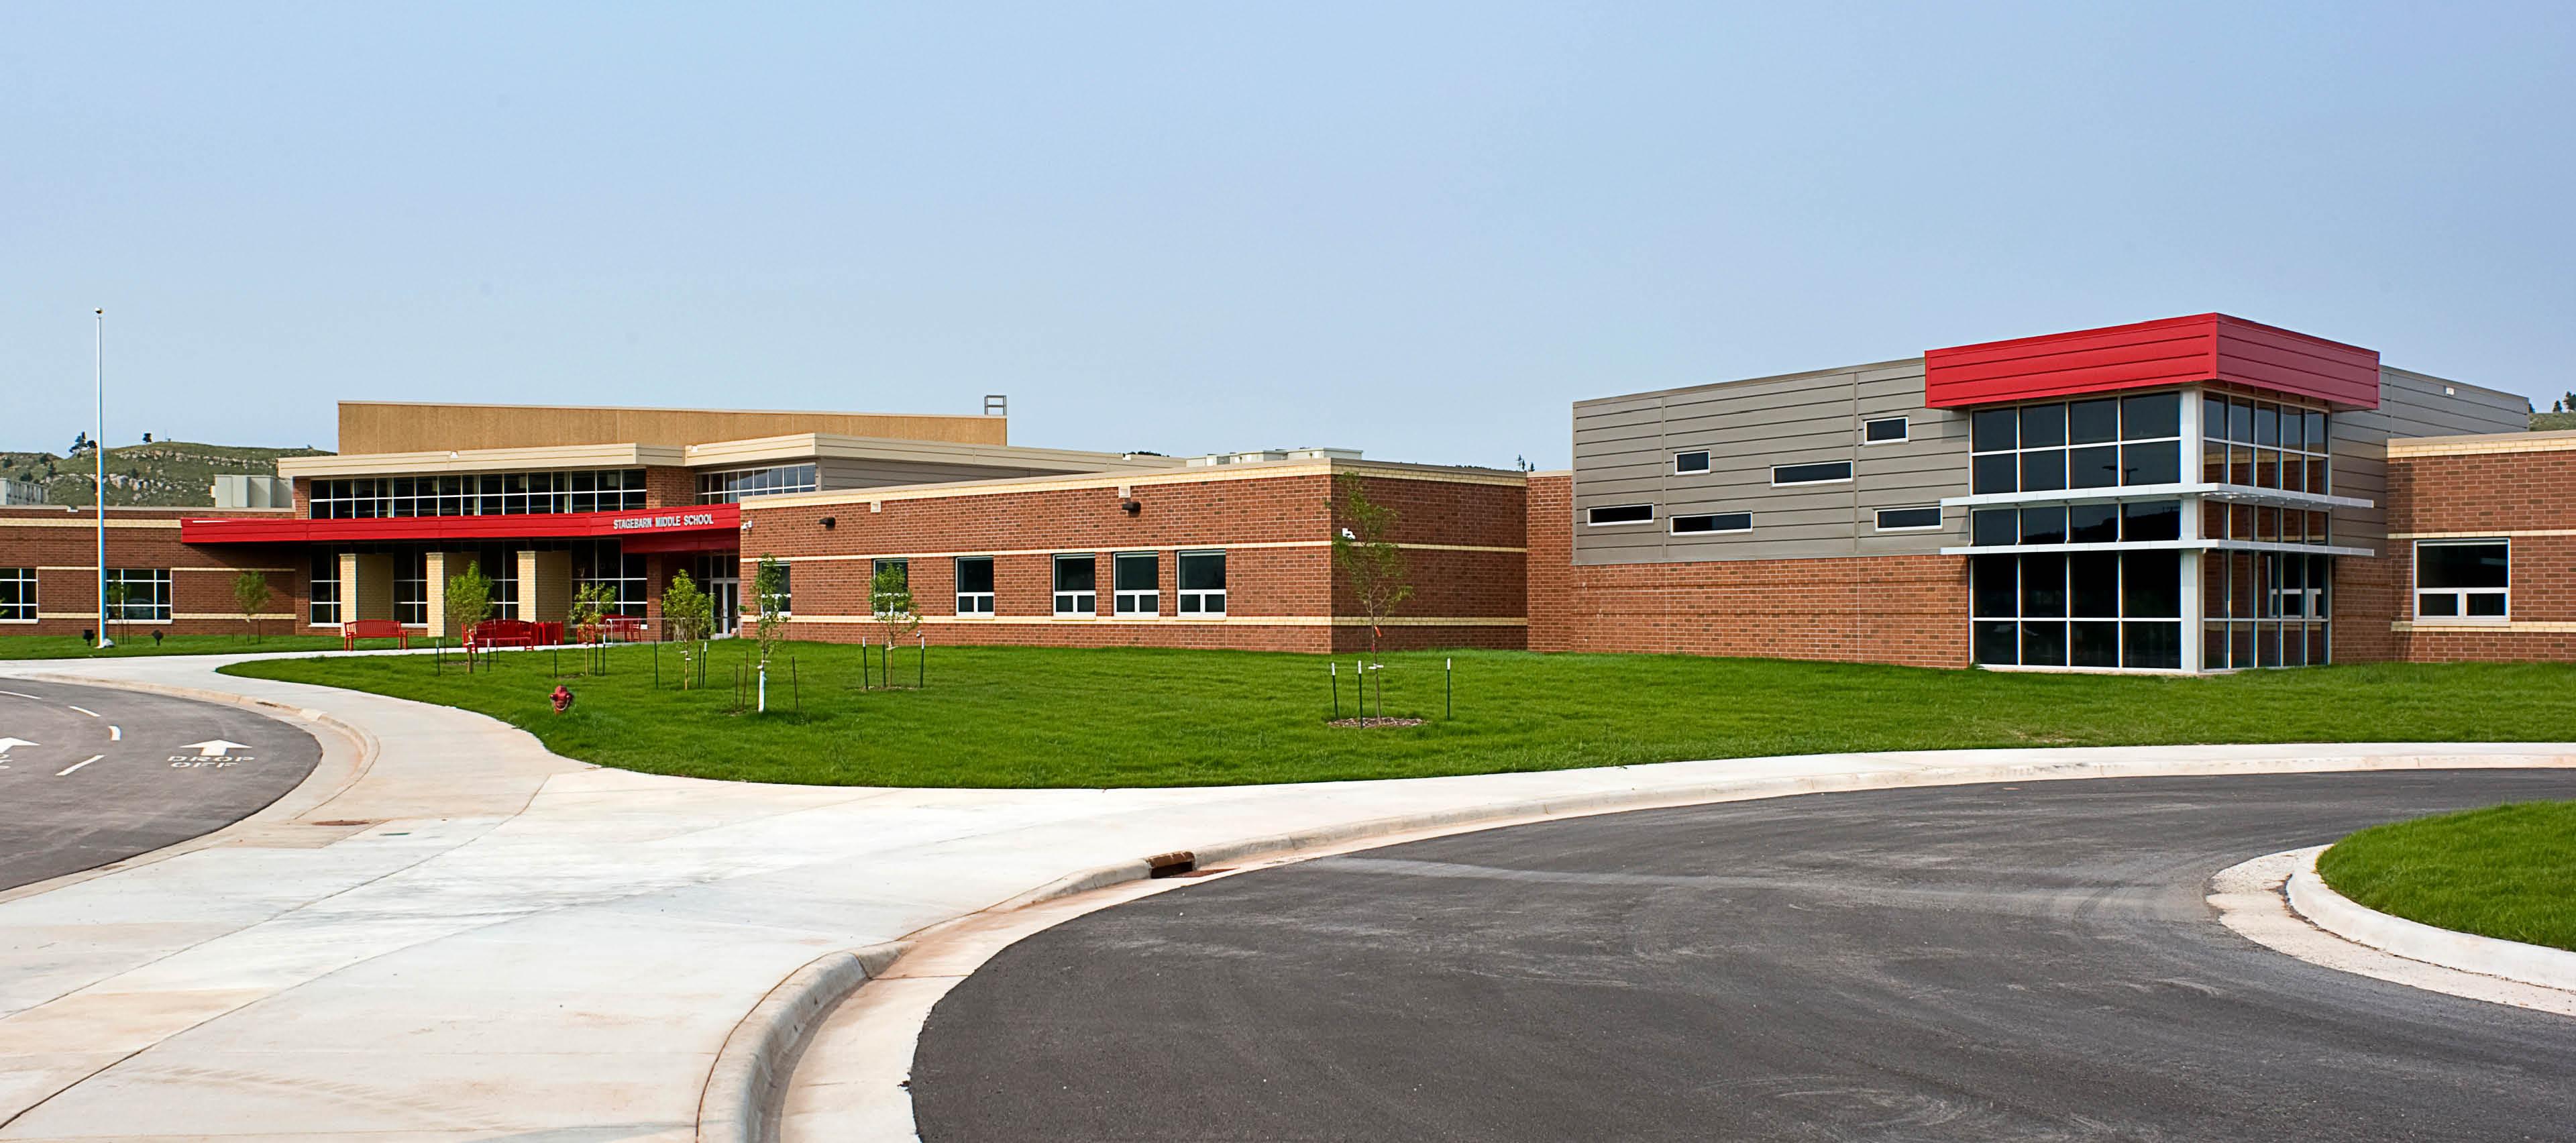 Stagebarn School